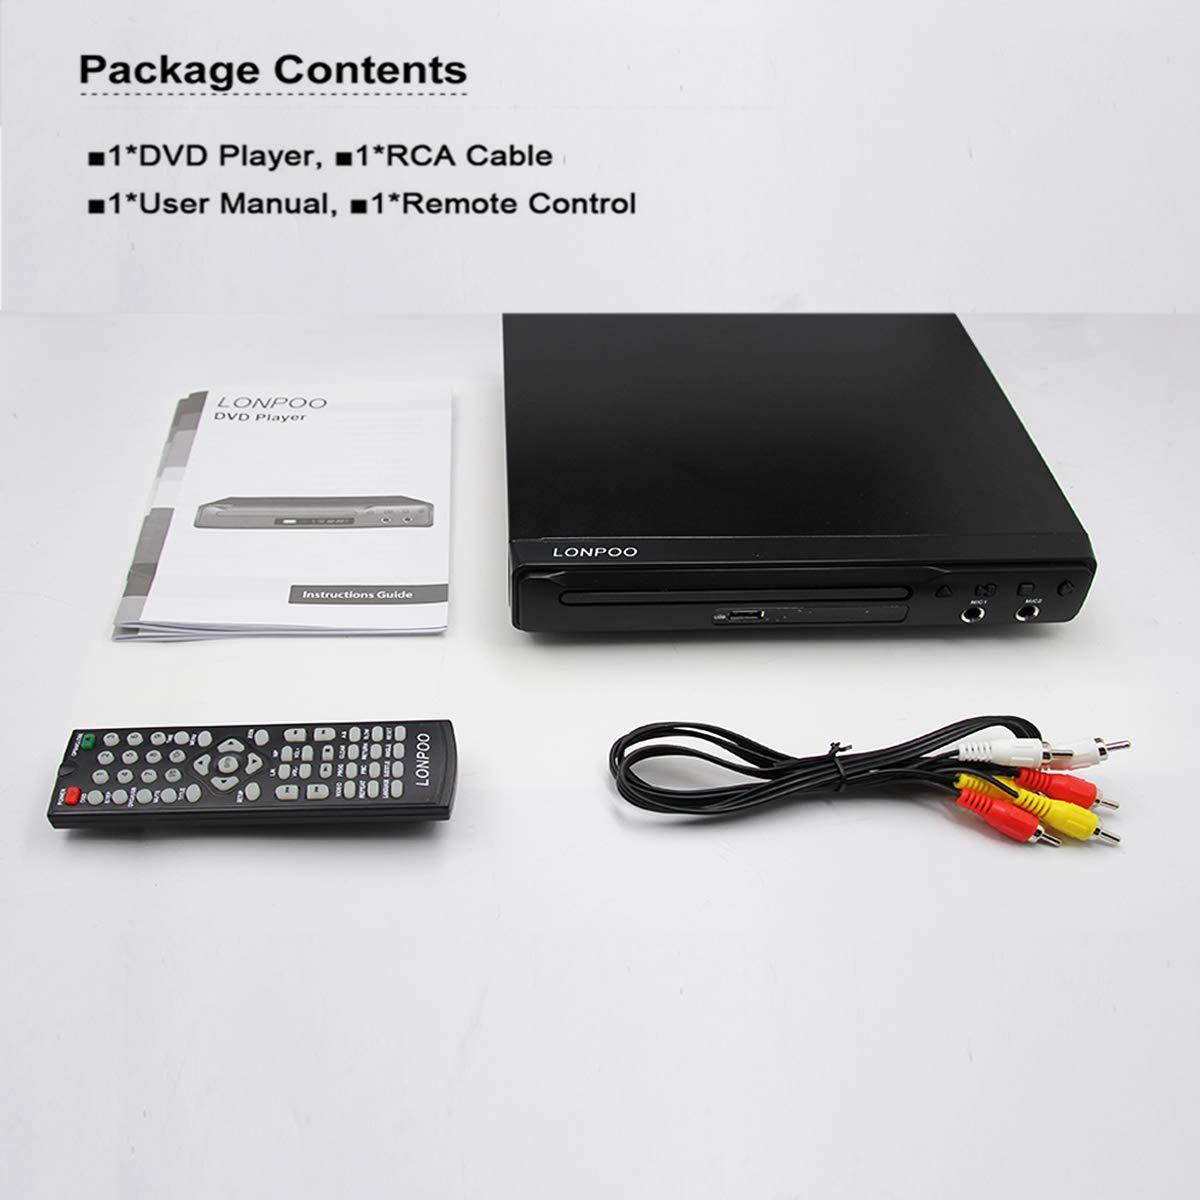 Amazon.com: Lonpoo - Caja metálica compacta para reproductor ...